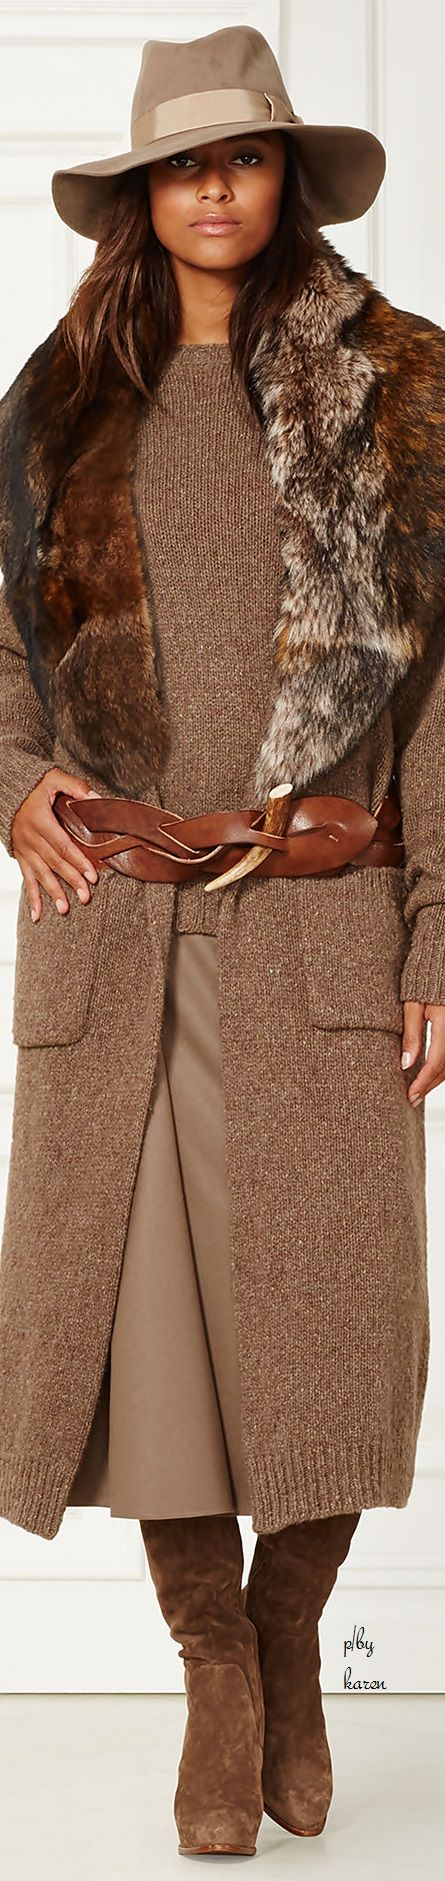 Diamond Cowgirl ~ Ralph Lauren Cashmire Coat